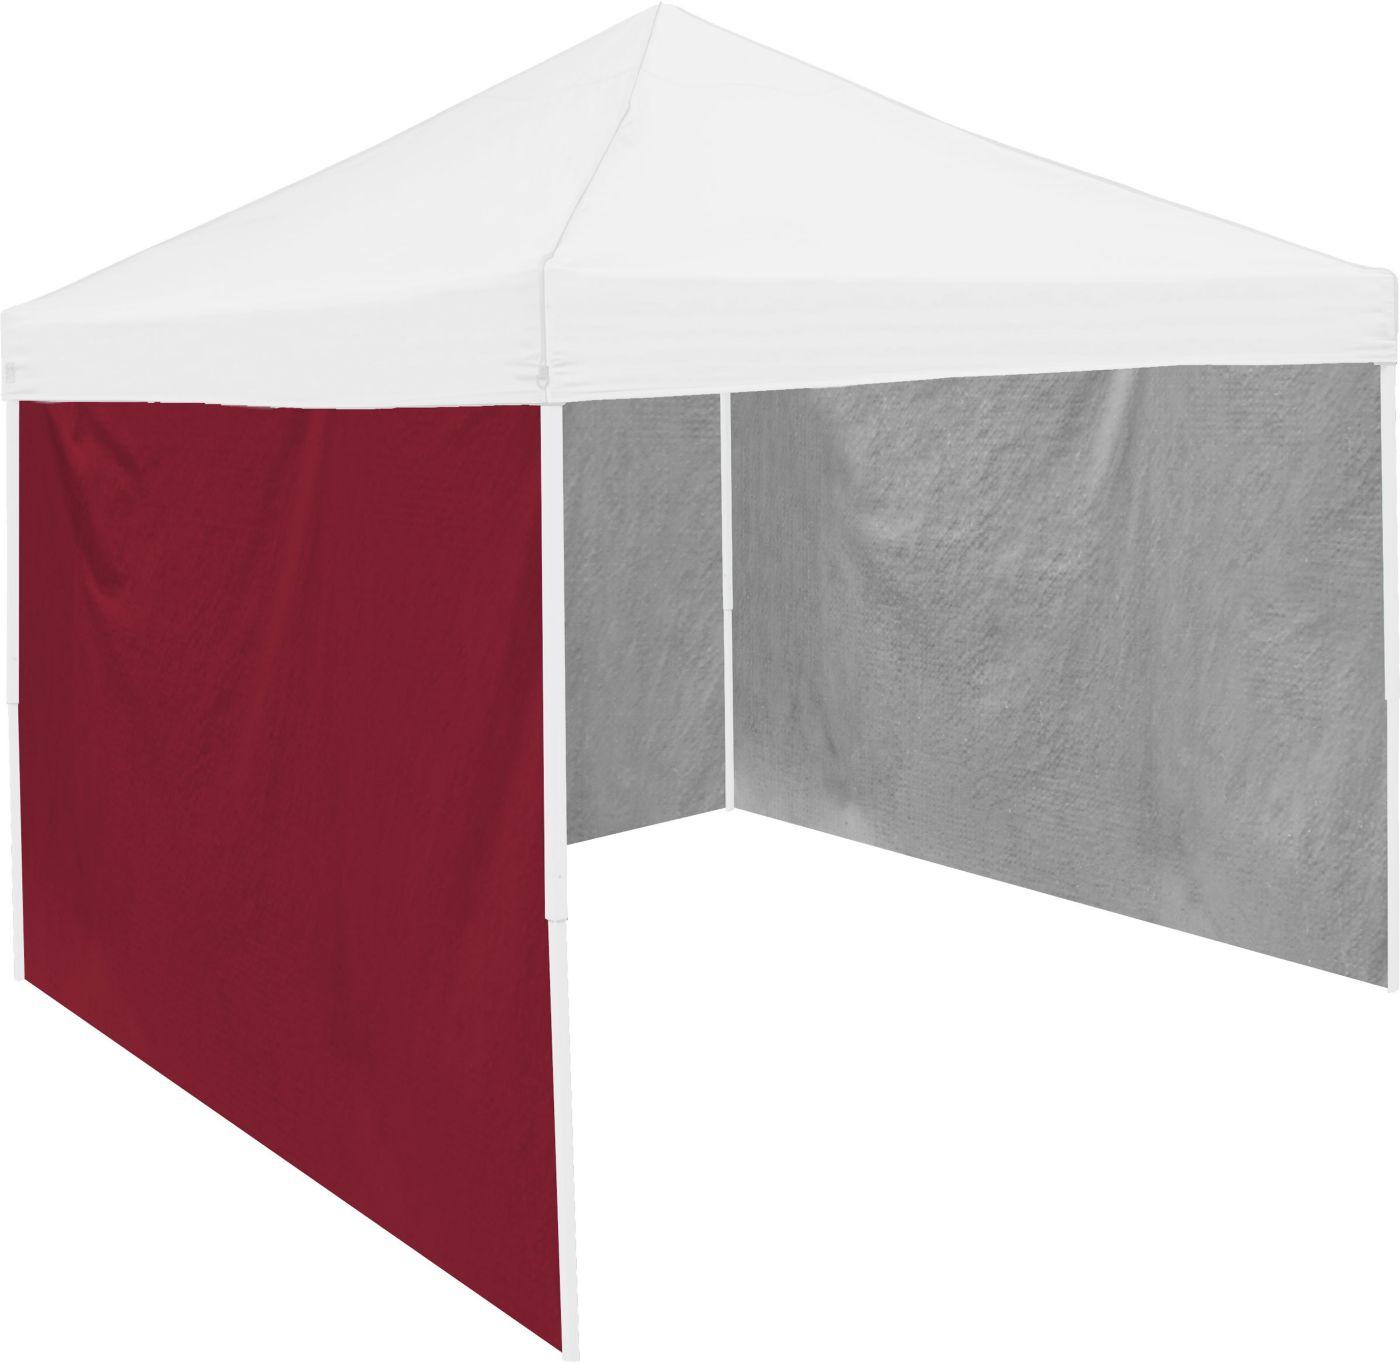 Garnet Tent Side Panel